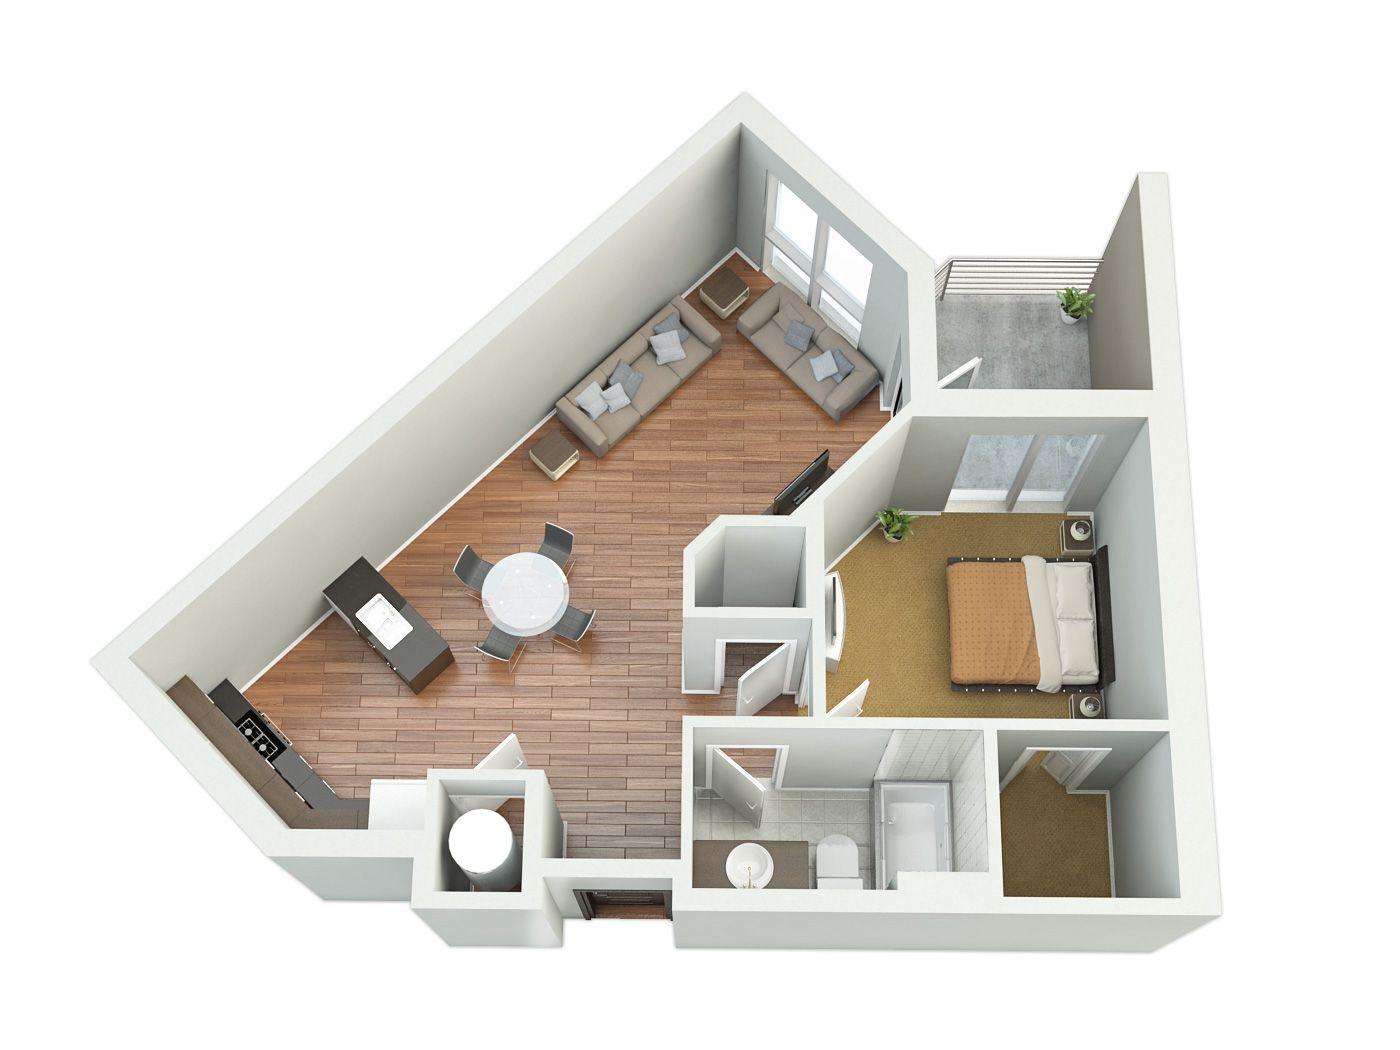 Architectural Design Cost 2d Floor Plan 20 Side Elevation 20 3d Floor Plan 25 Interi Small Apartment Floor Plans Sims House Design House Plans